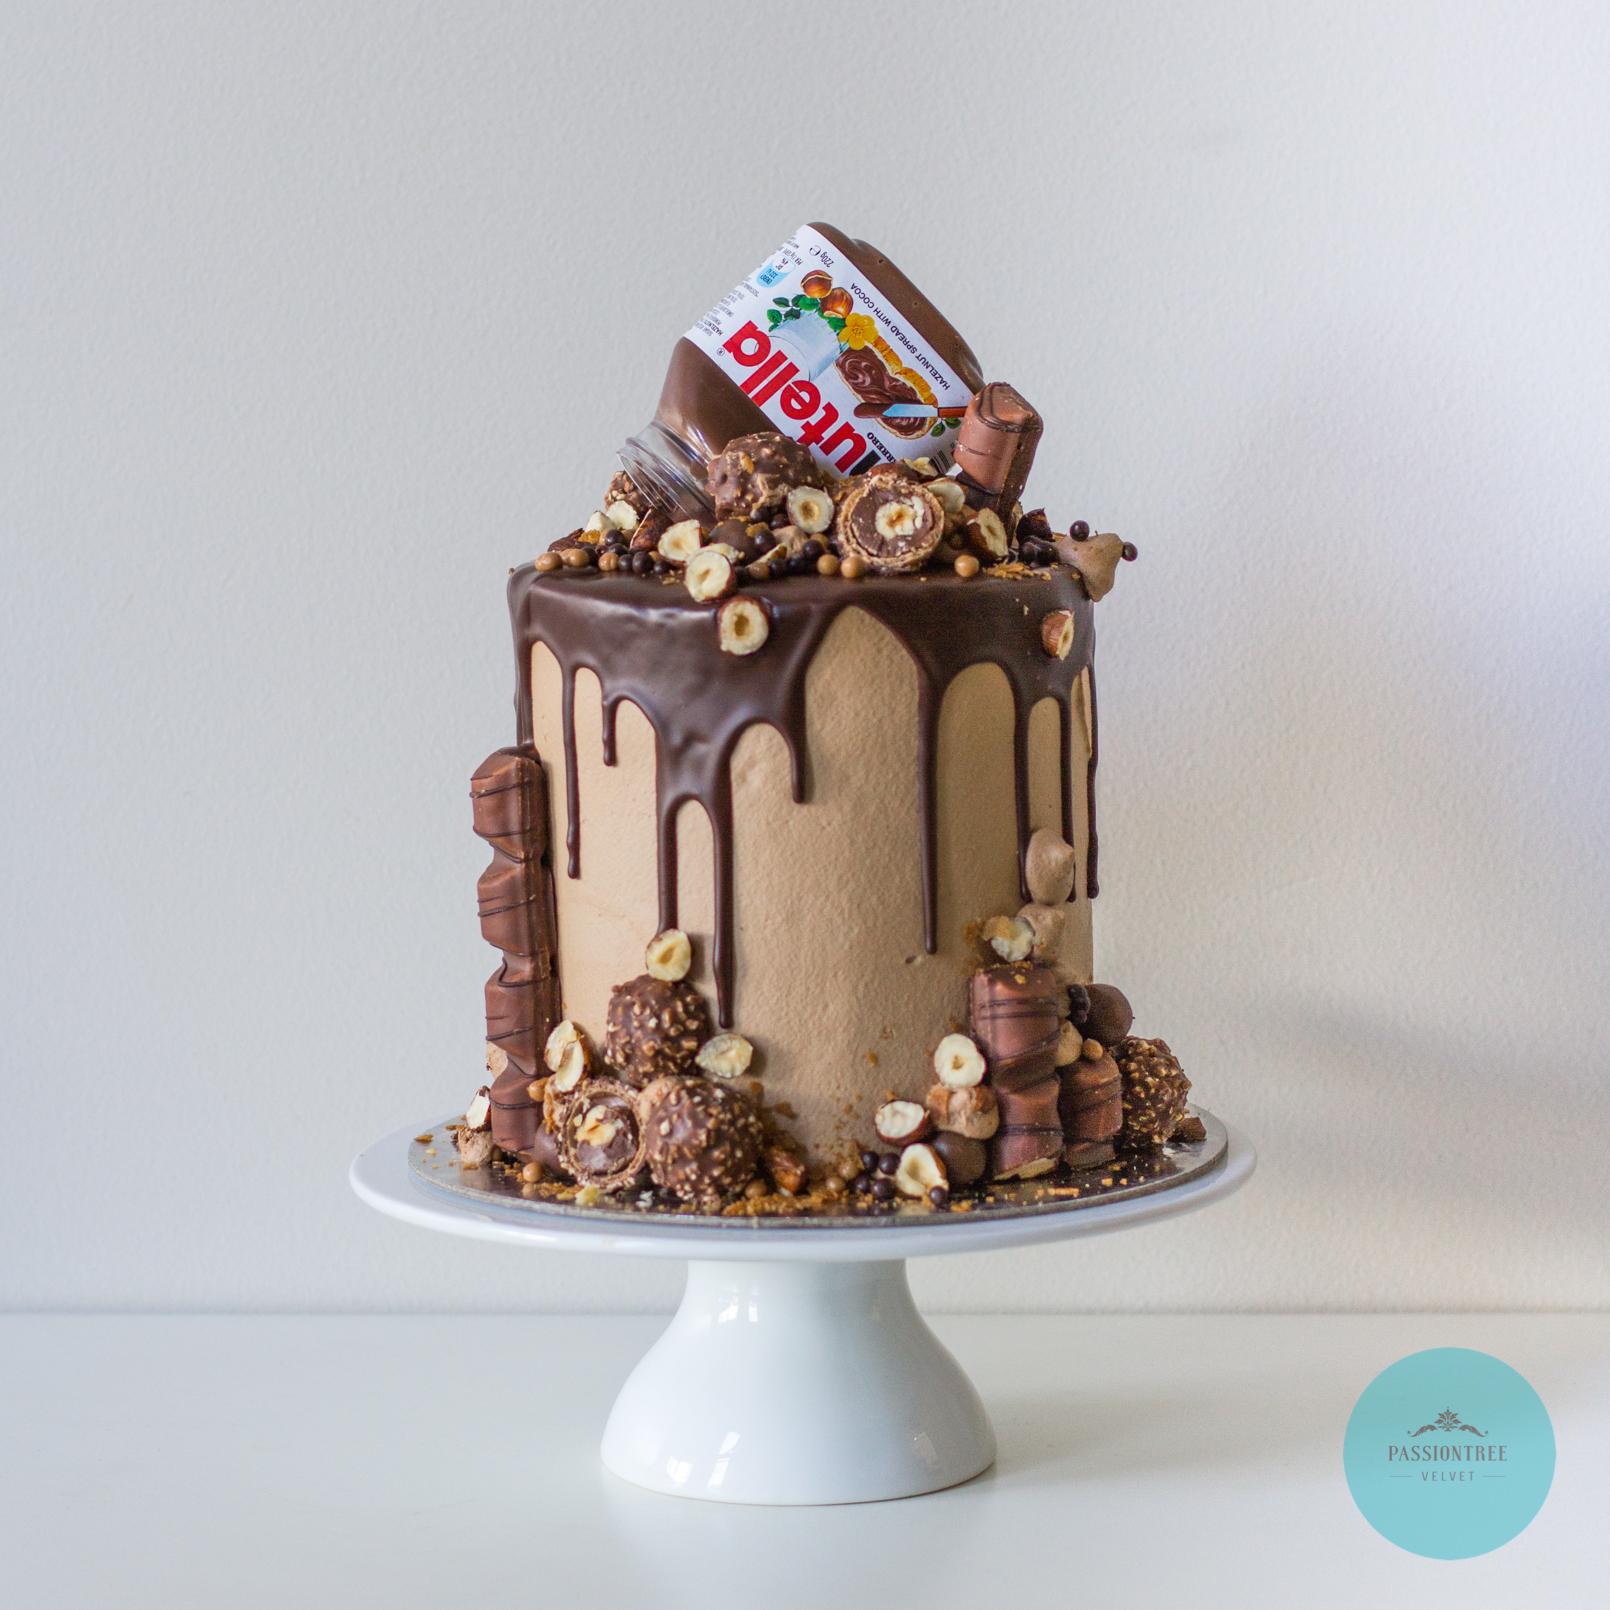 "6"" Passiontree Velvet Custom Birthday Cake"